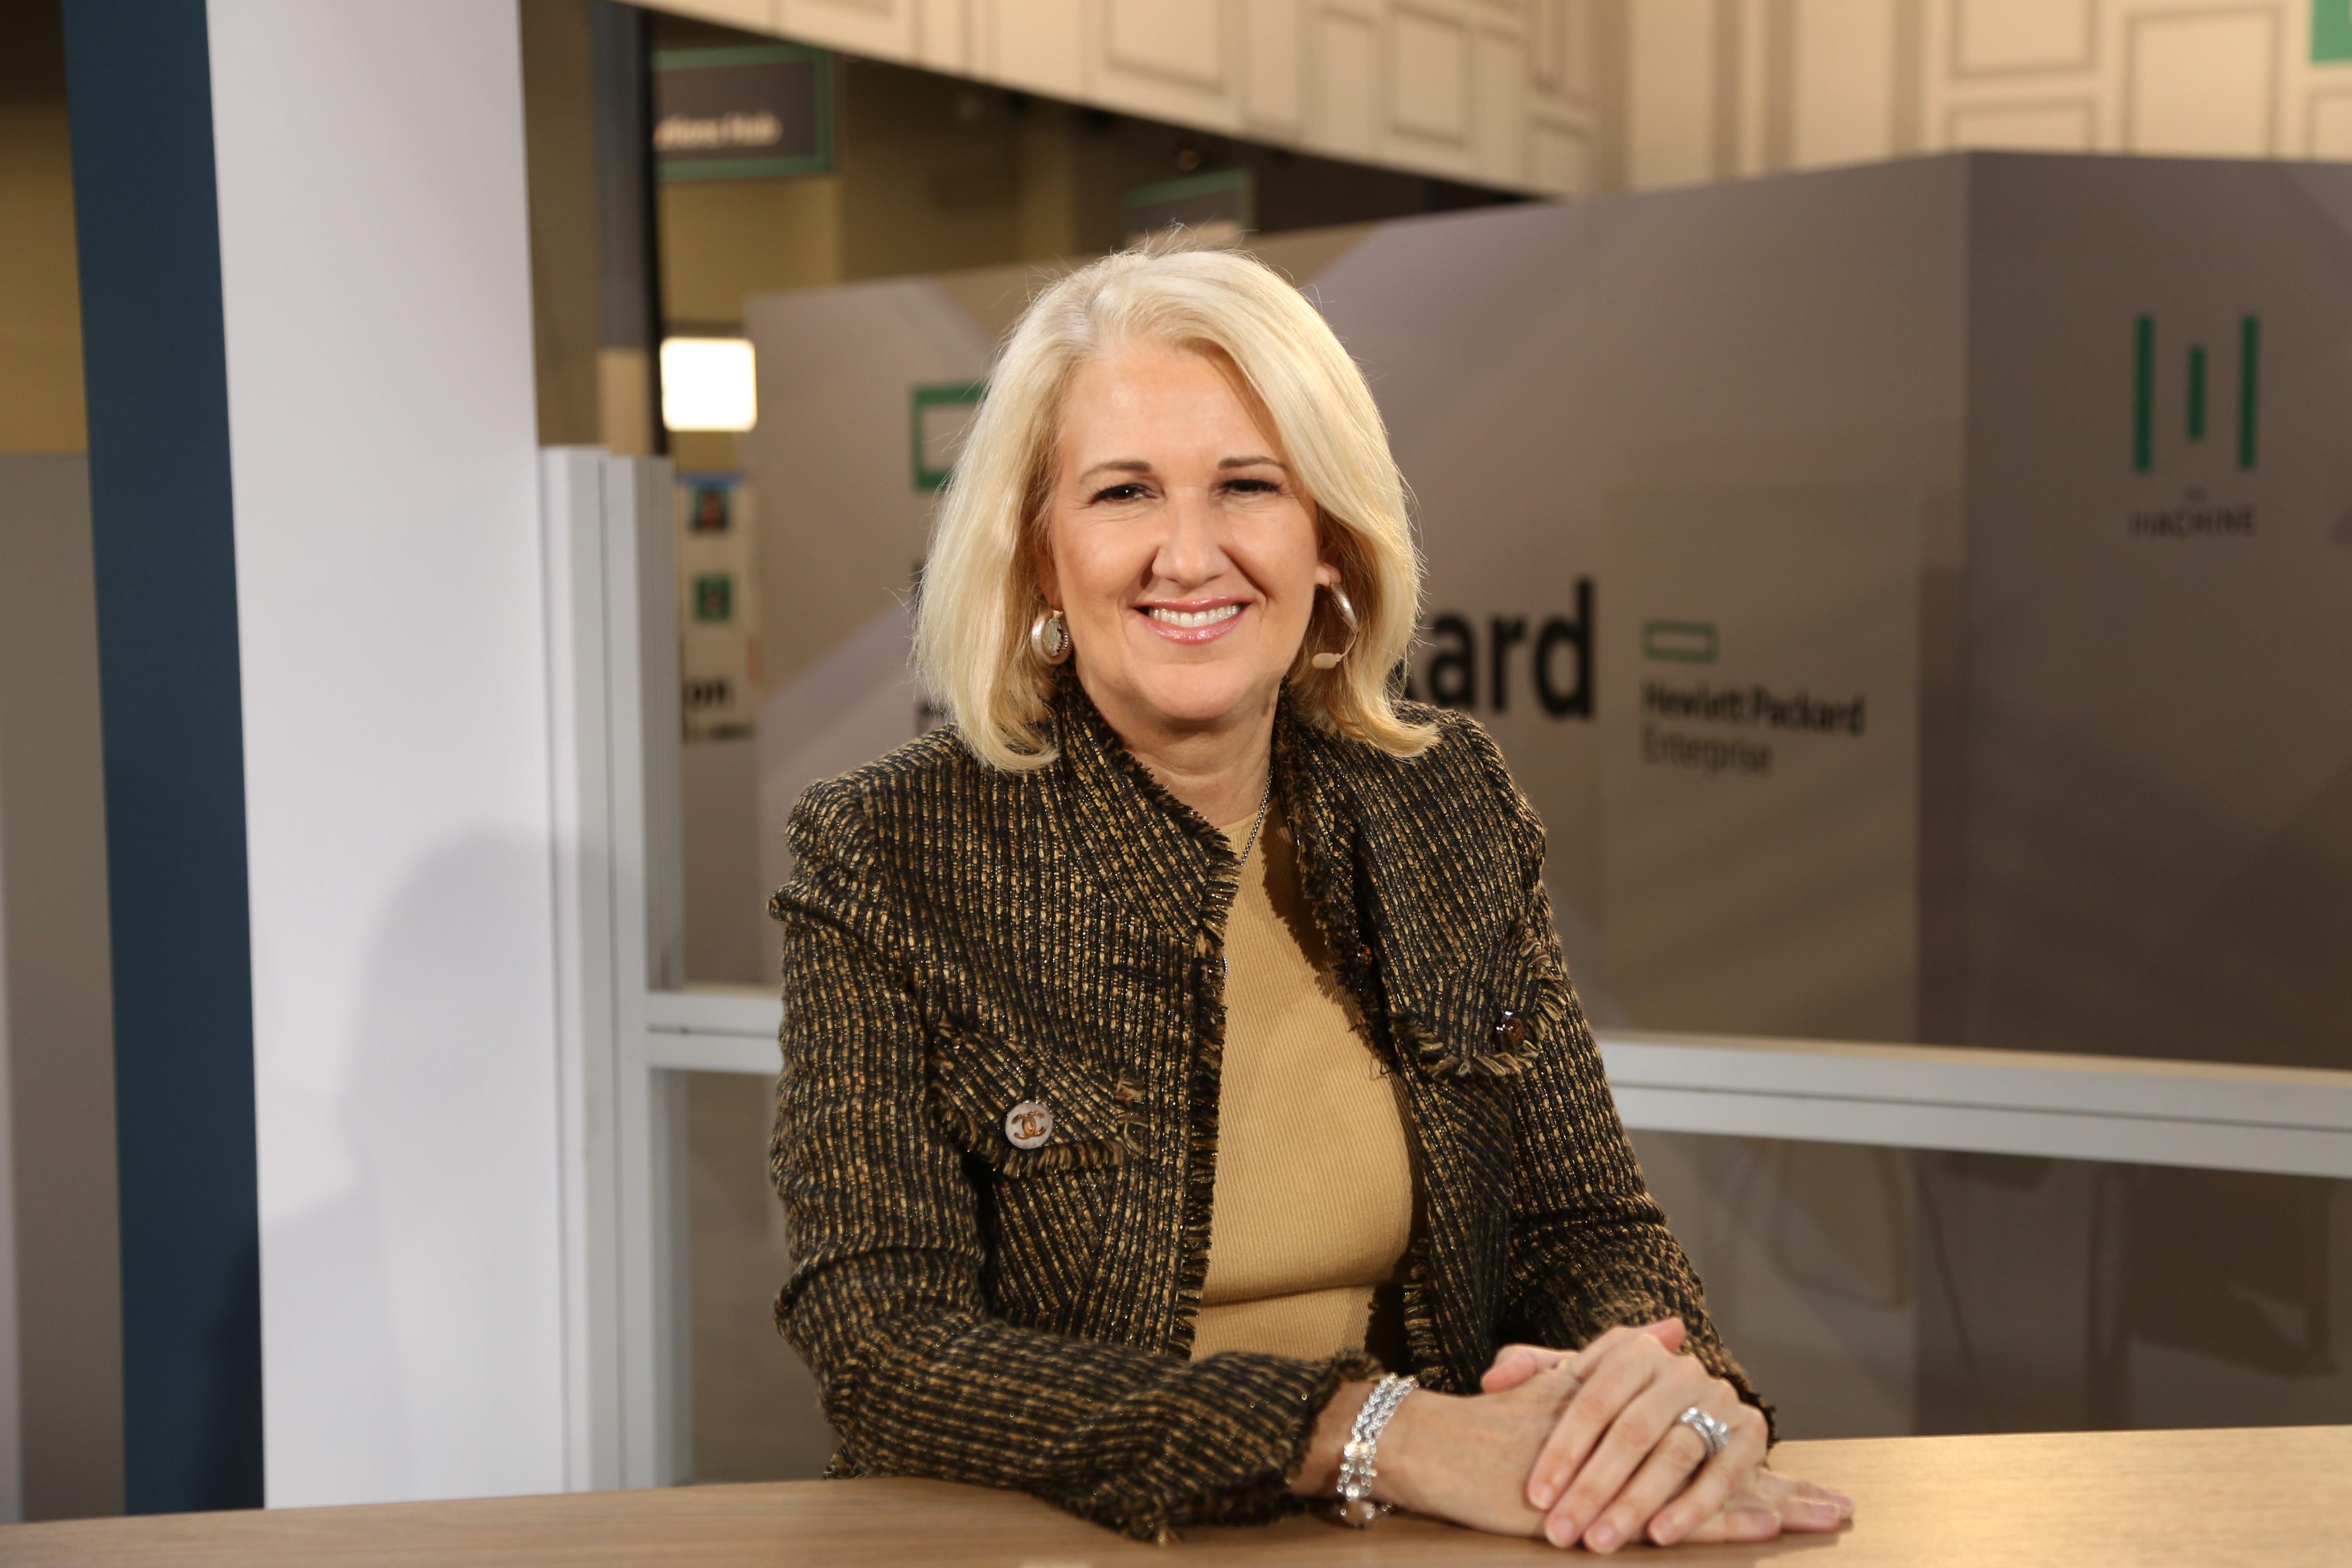 KBC Group NV Sells 621121 Shares of Hewlett Packard Enterprise Co (HPE)